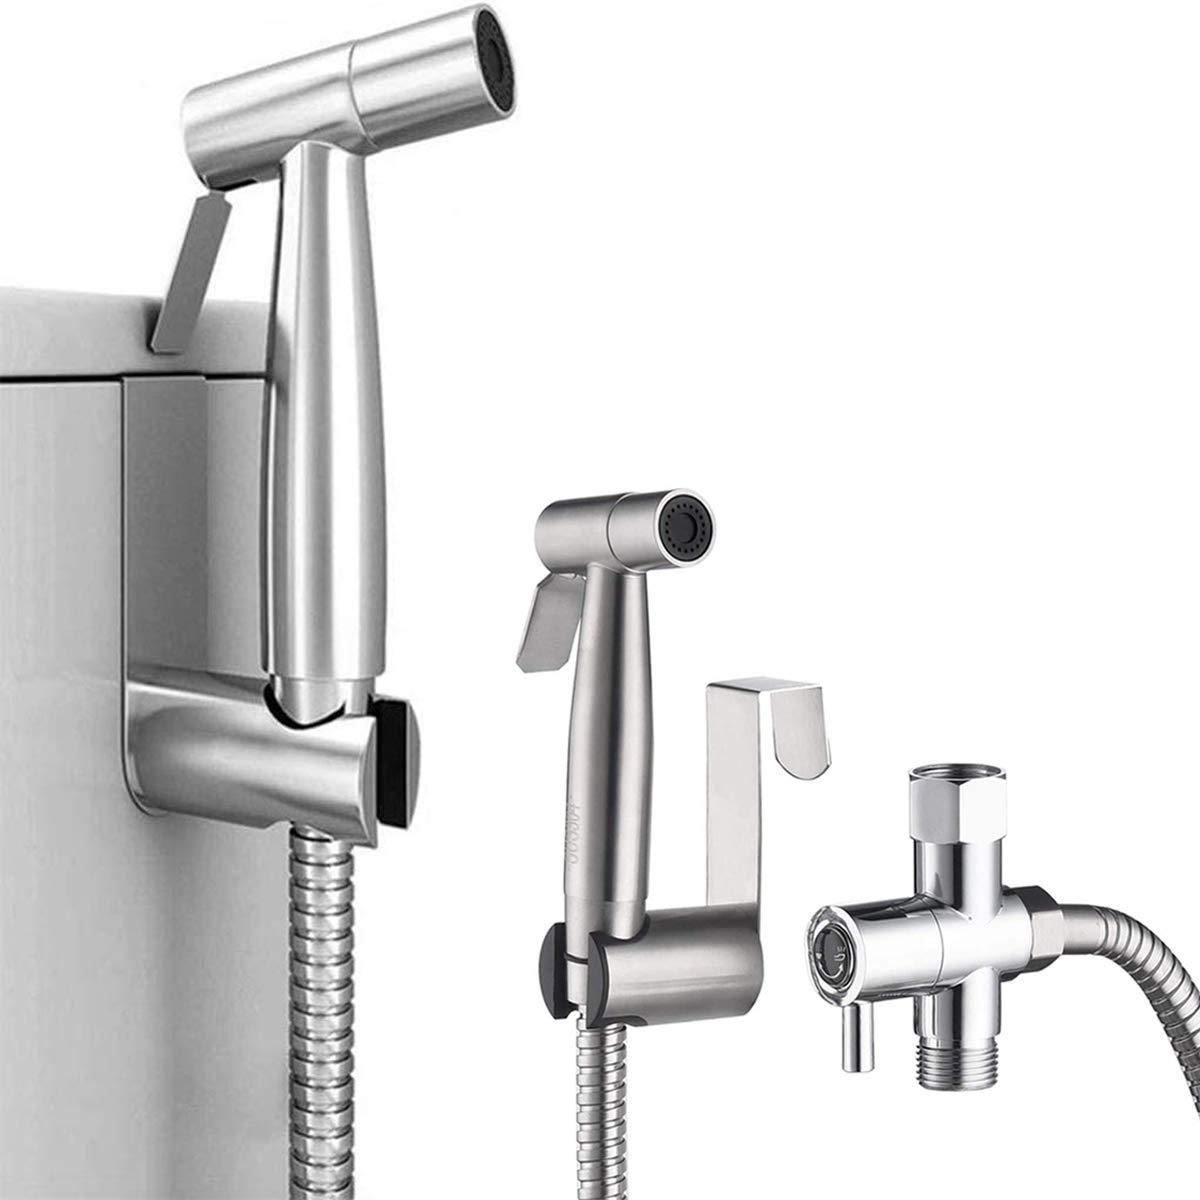 JAKAGO Handheld Bidet Toilet Seat Sprayer Bathroom Shower Sprayer Baby Diaper Cloth Washer, Stainless Steel Bathroom Spray with Adjustable Pressure Control for Personal Hygiene,Pet Shower